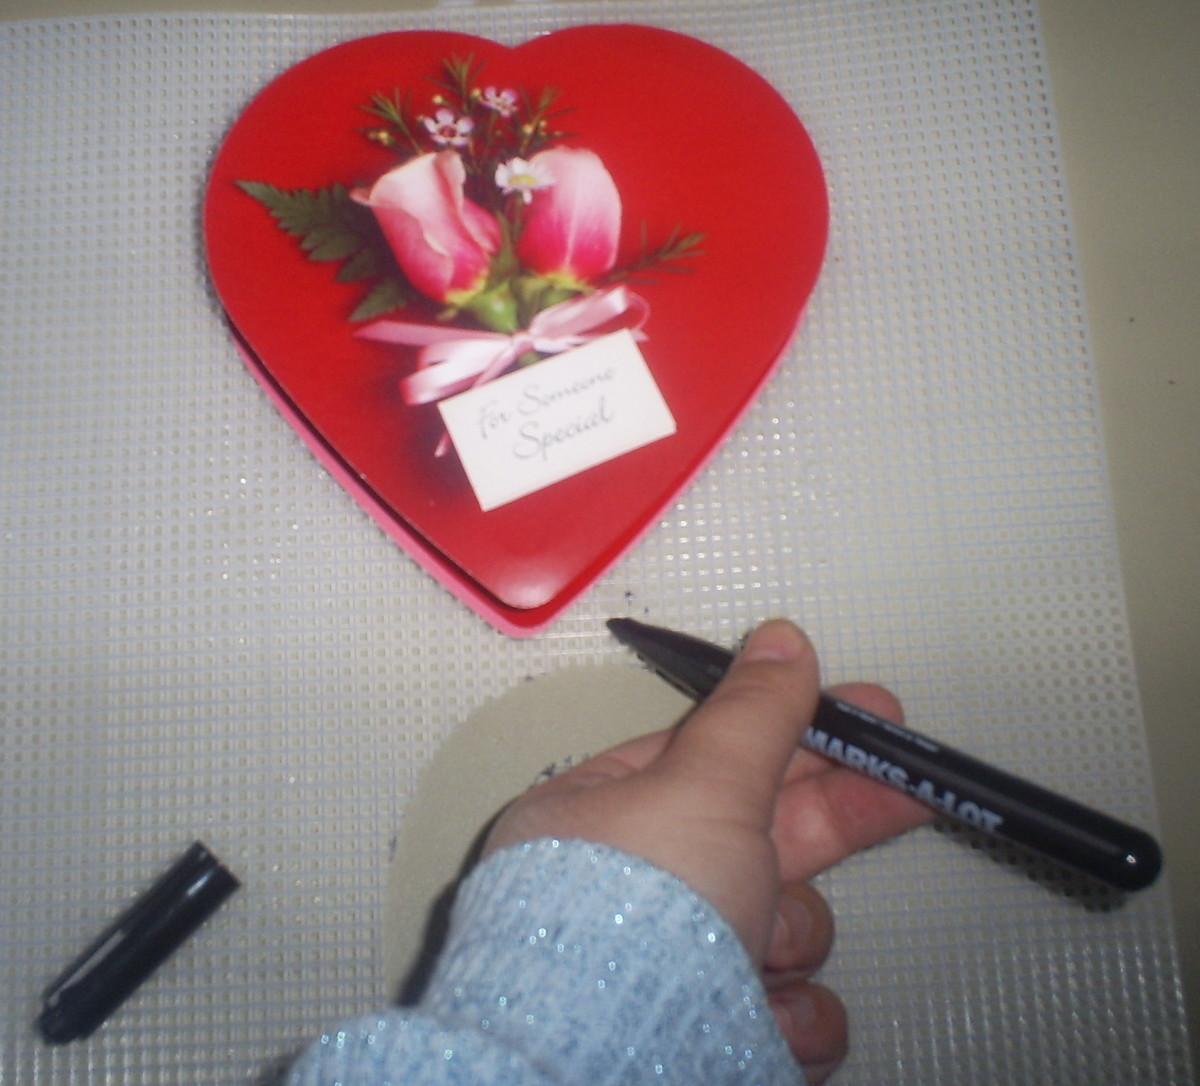 Trace around the heart shape box.